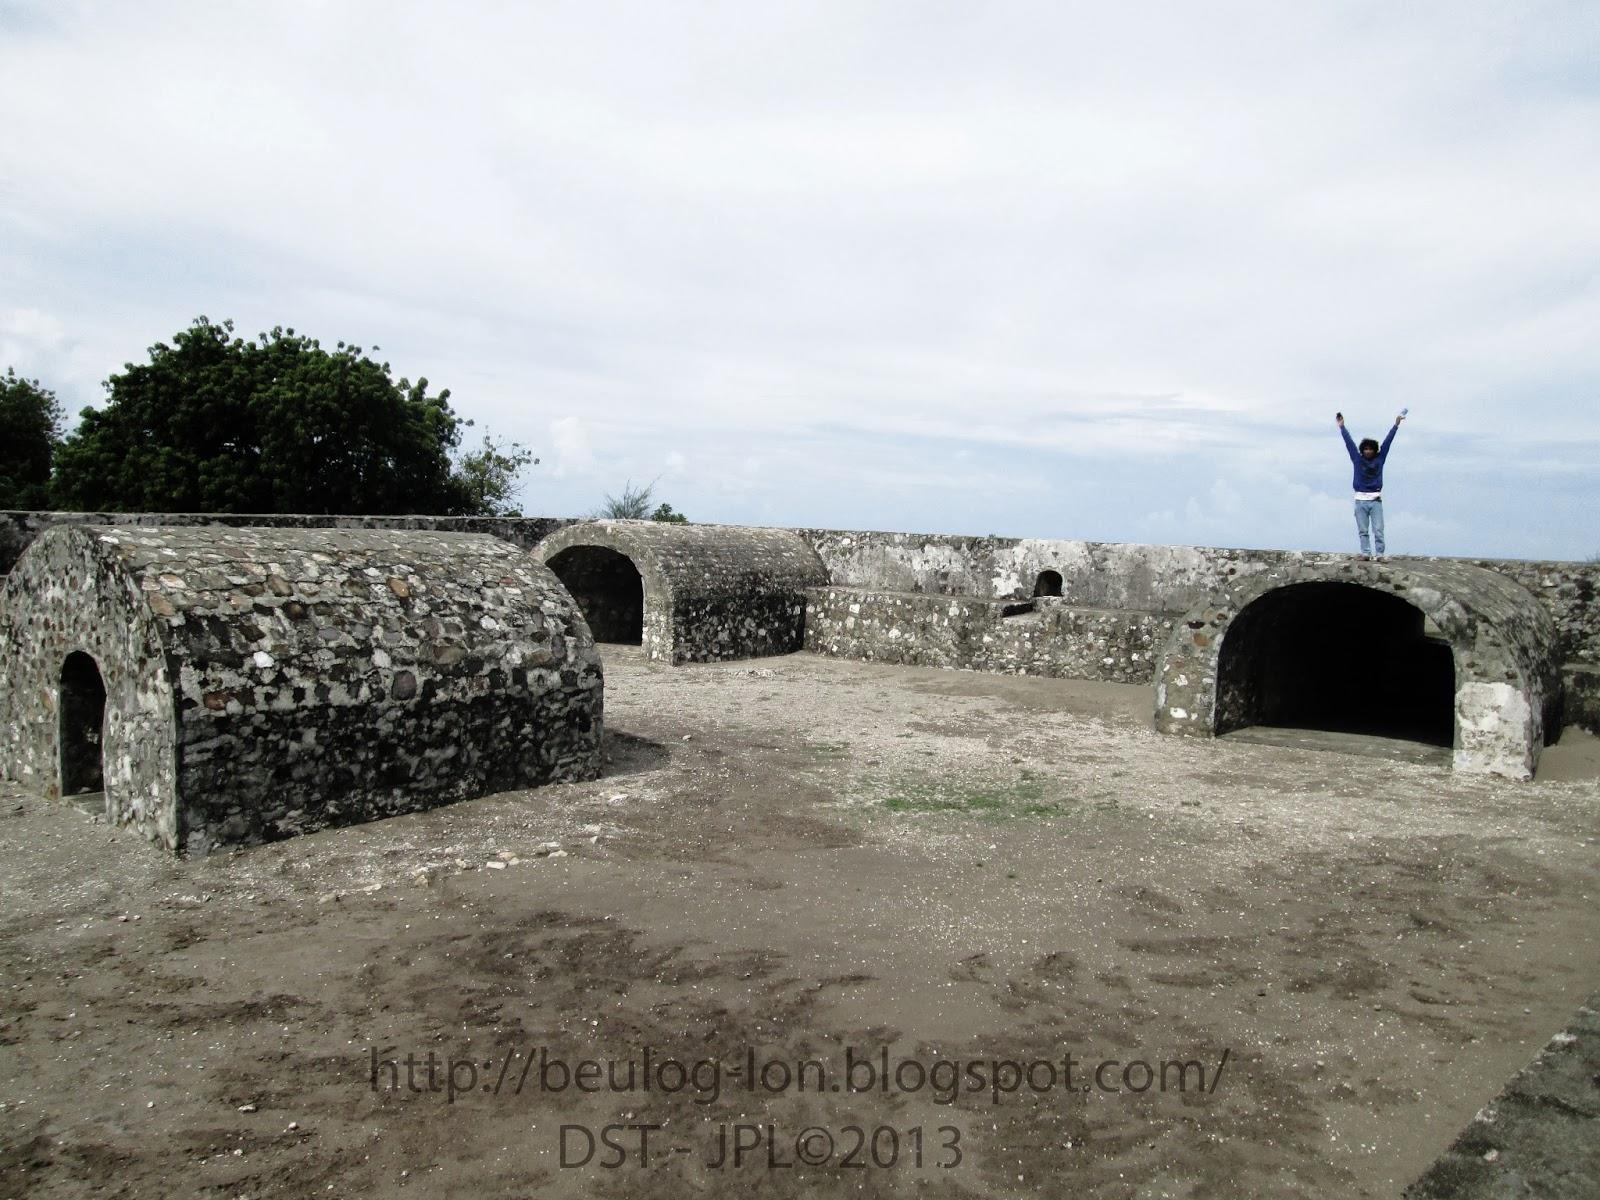 Benteng Indra Patra Bukti Historis Perlahan Terkikis 0 Response Indrapatra